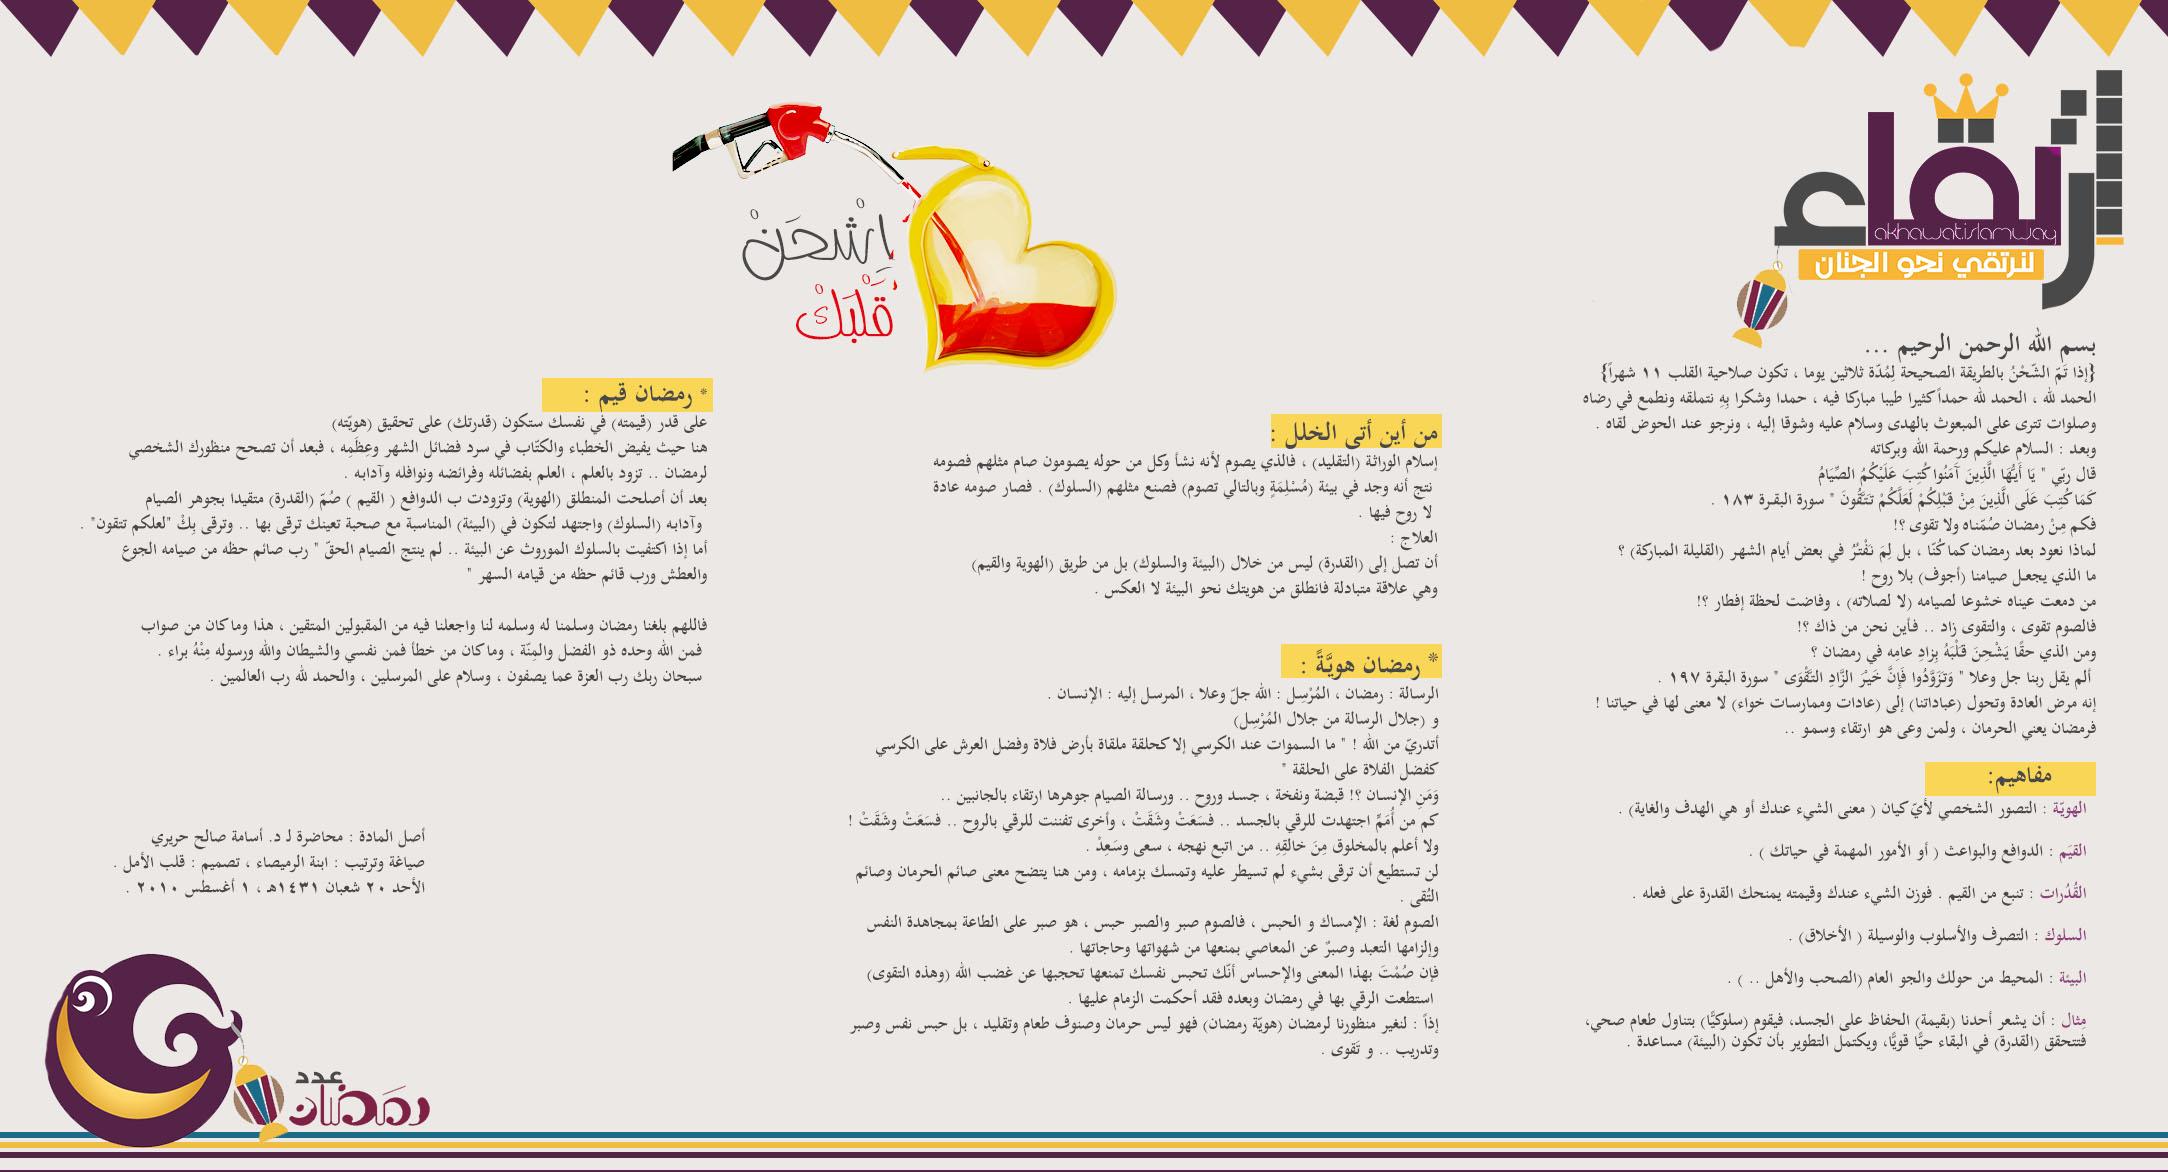 akhawat_islamway_1493990983____1.jpg